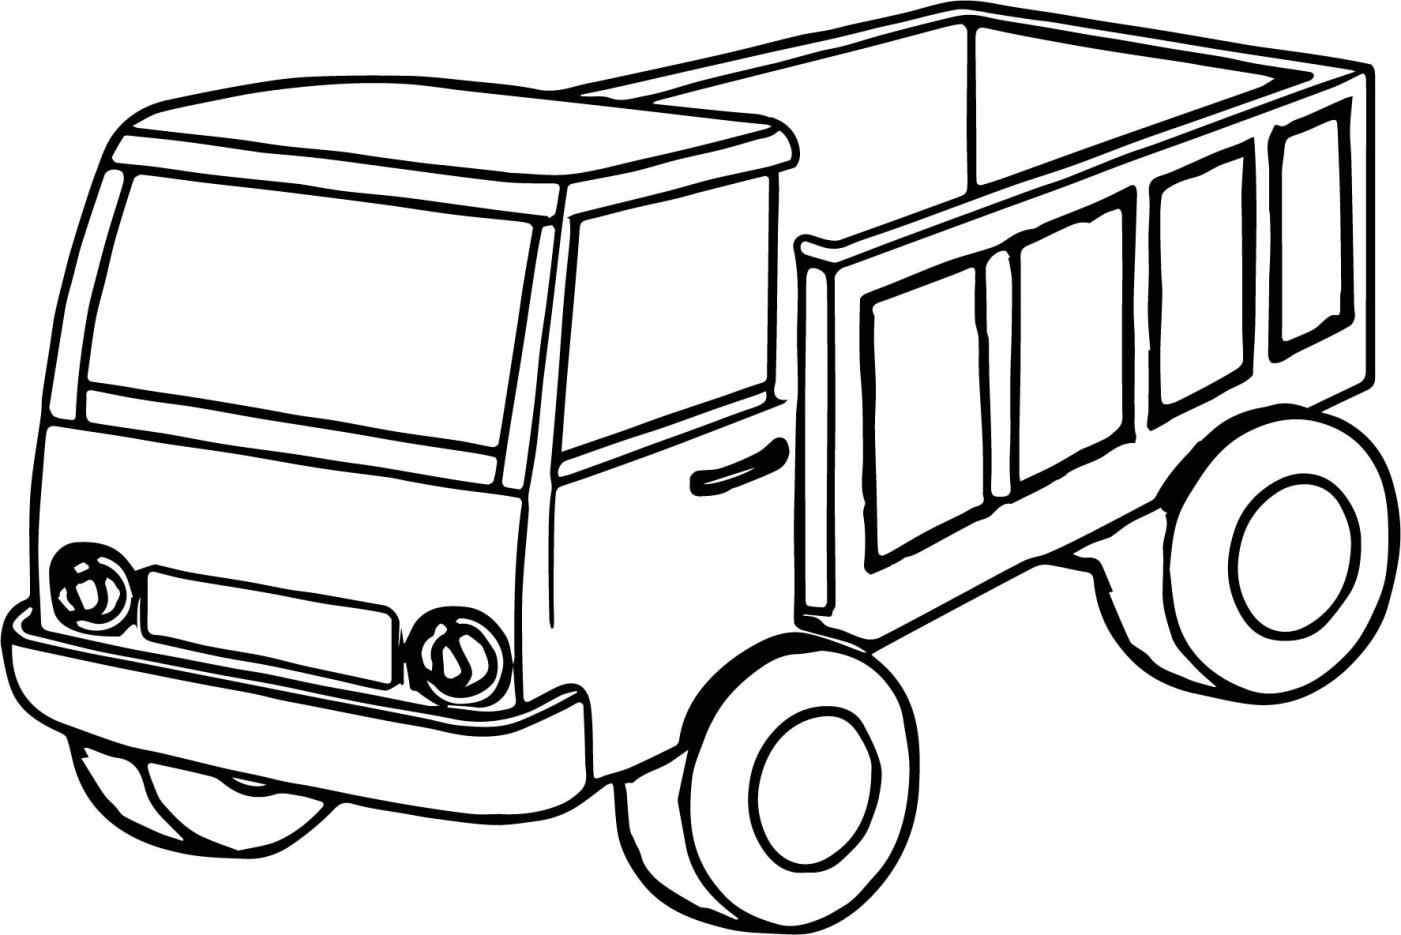 1401x935 Mud Truck Silhouette Truckindo.win